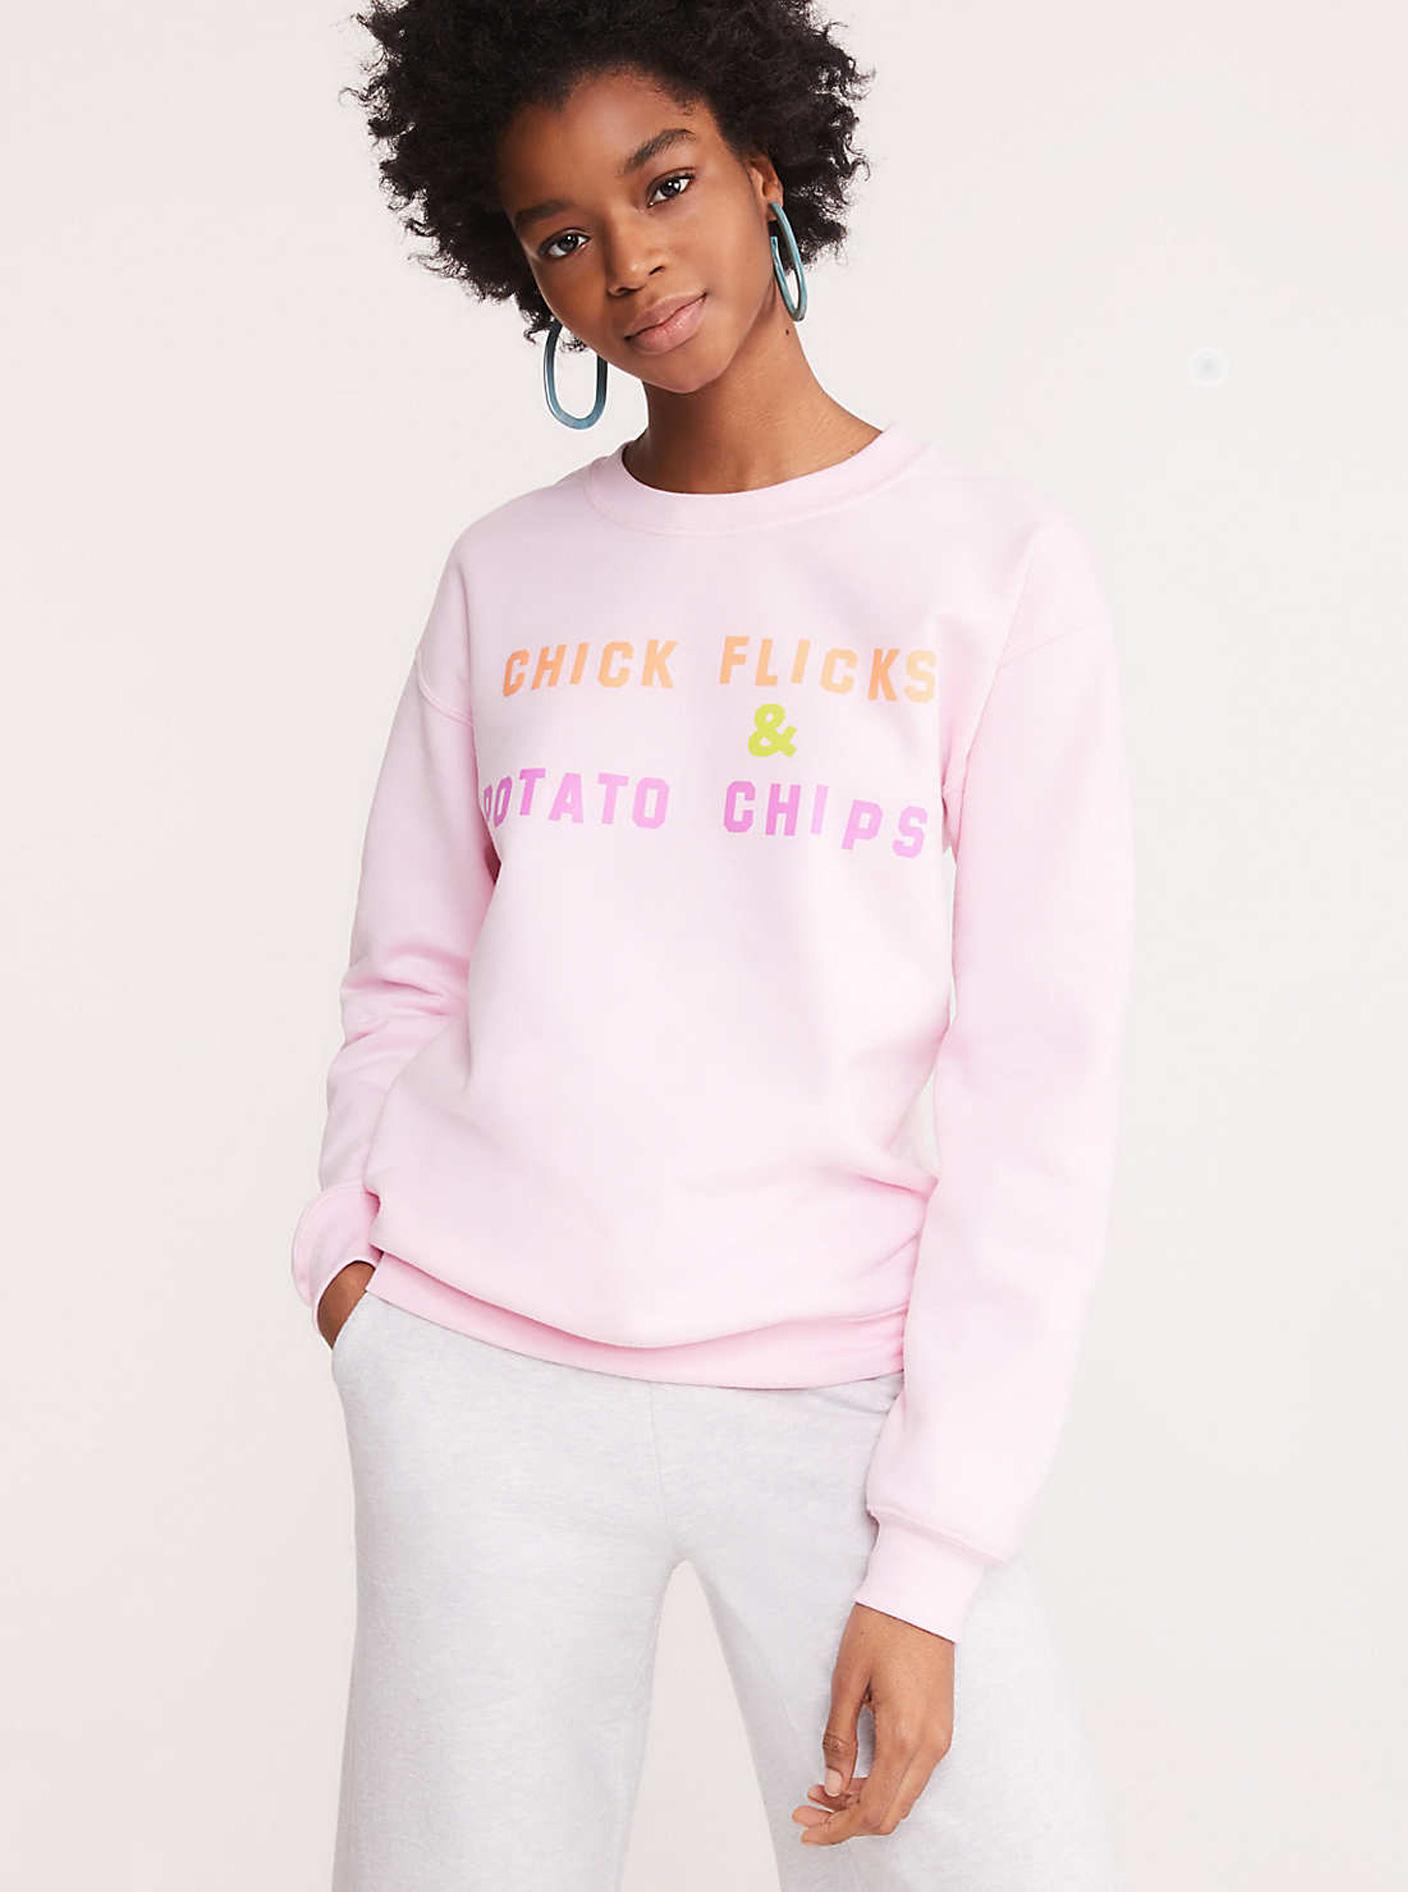 feb-cart-katie-kimmel-sweatshirt.jpg